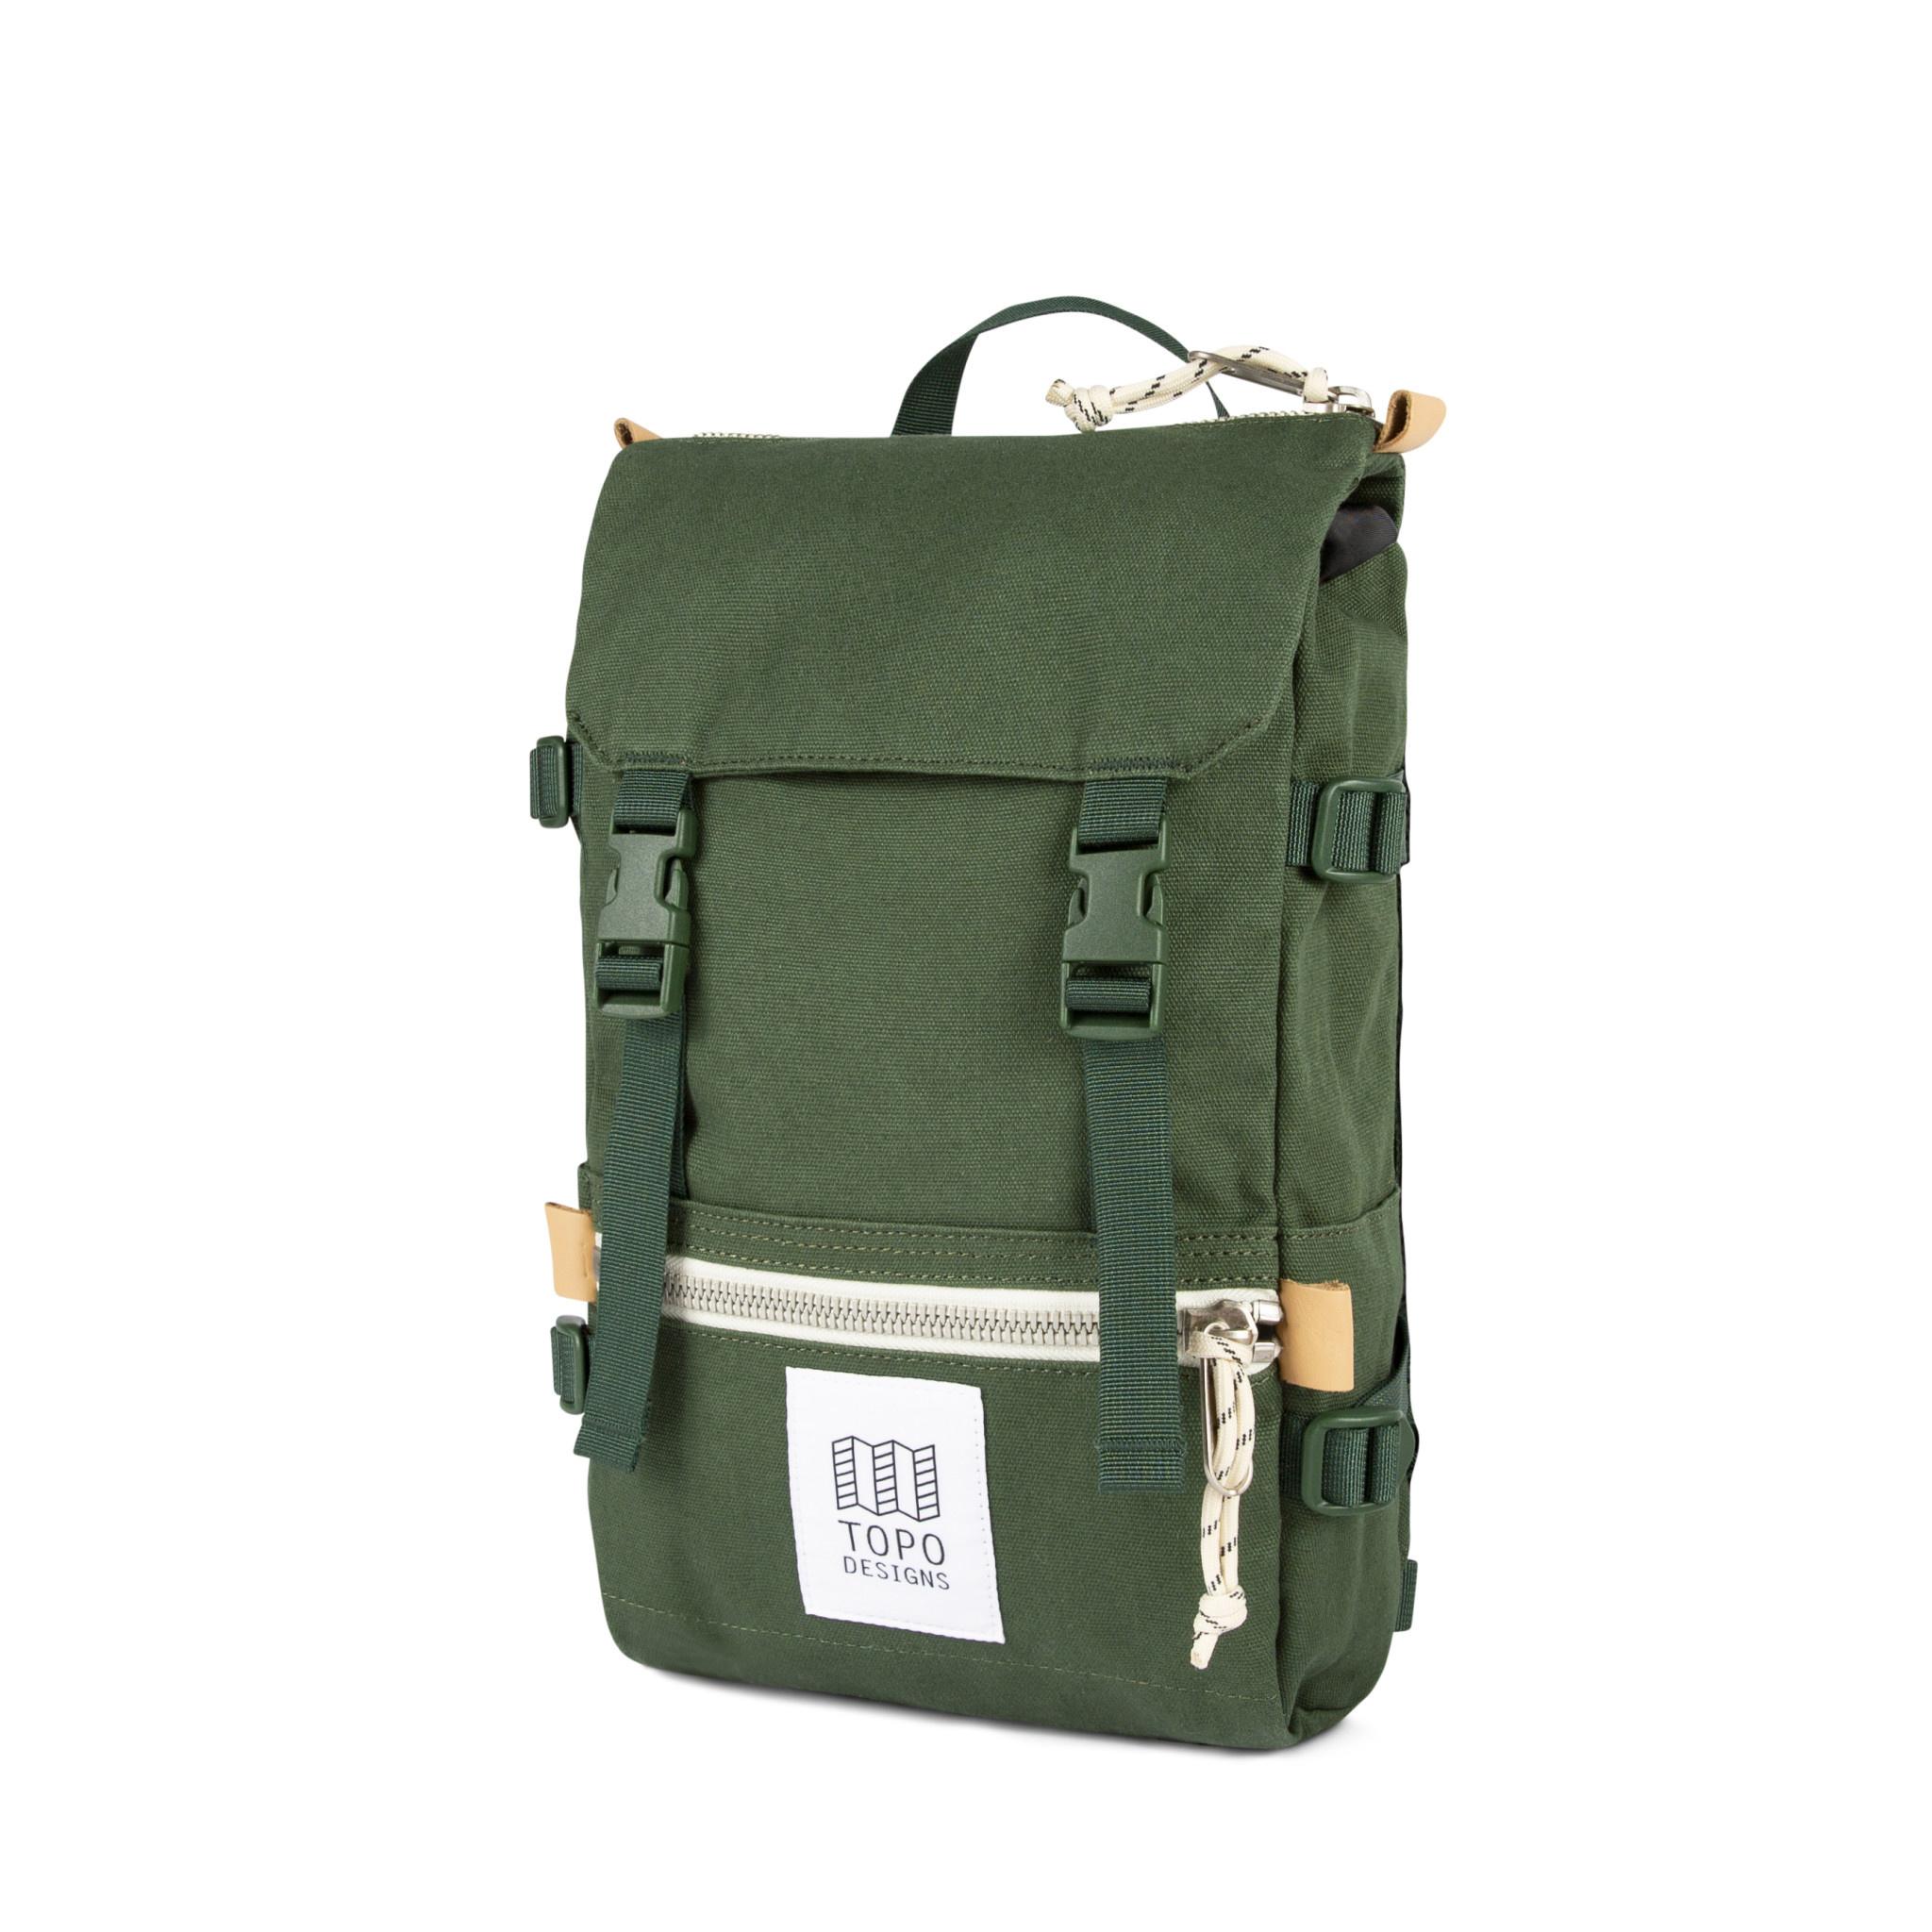 Topo Topo Rover Pack Mini Backpack